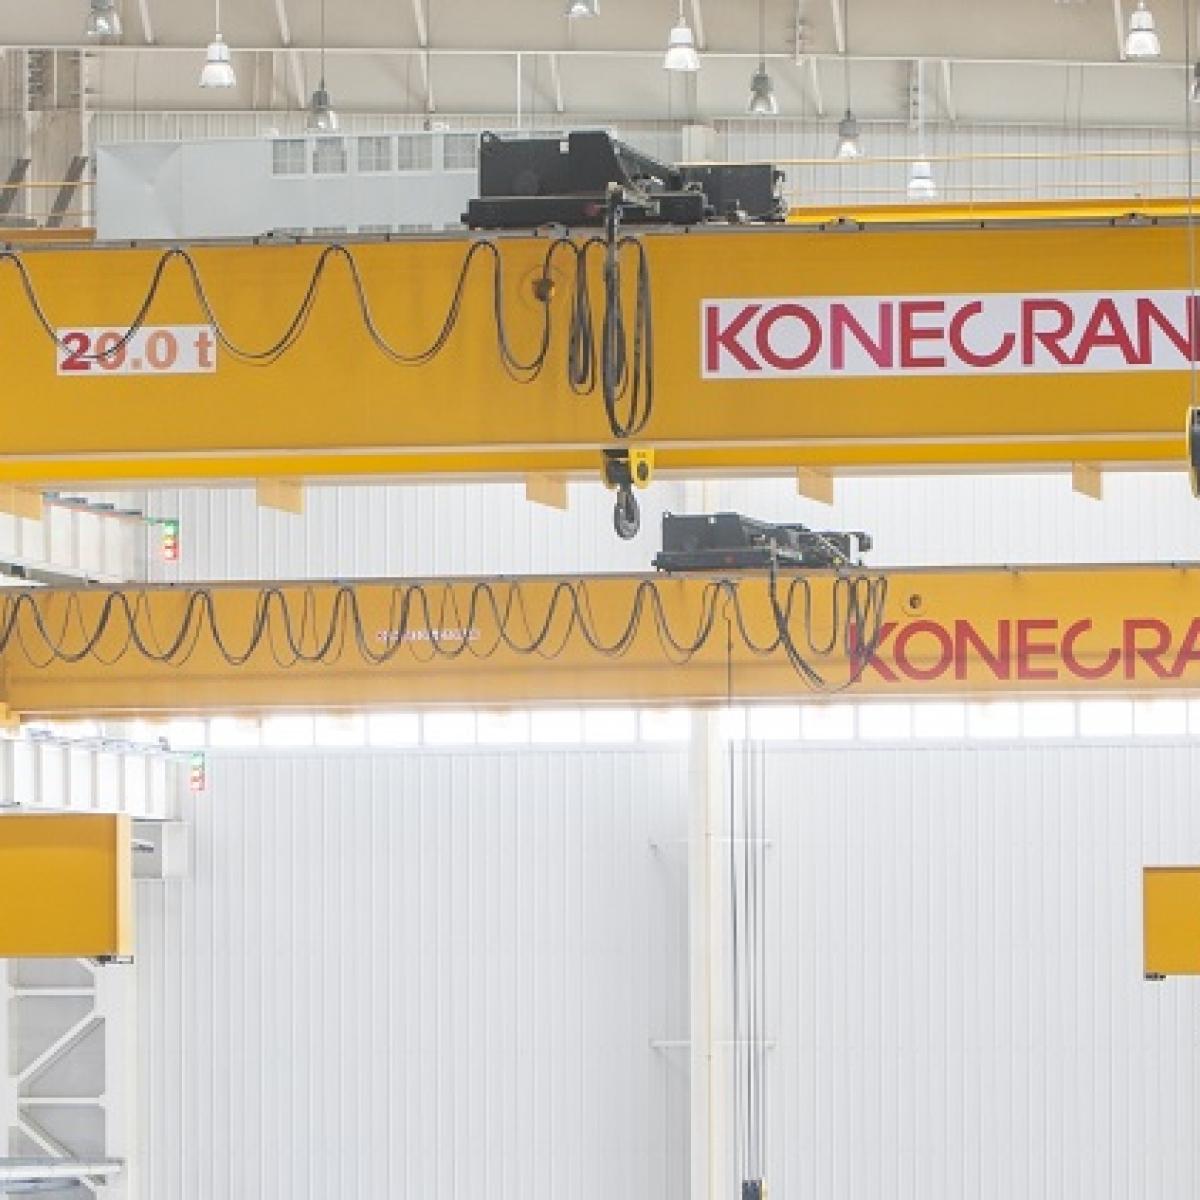 Cxt Wire Rope Hoist Cranes Konecranes Macau Electrical Wiring Code